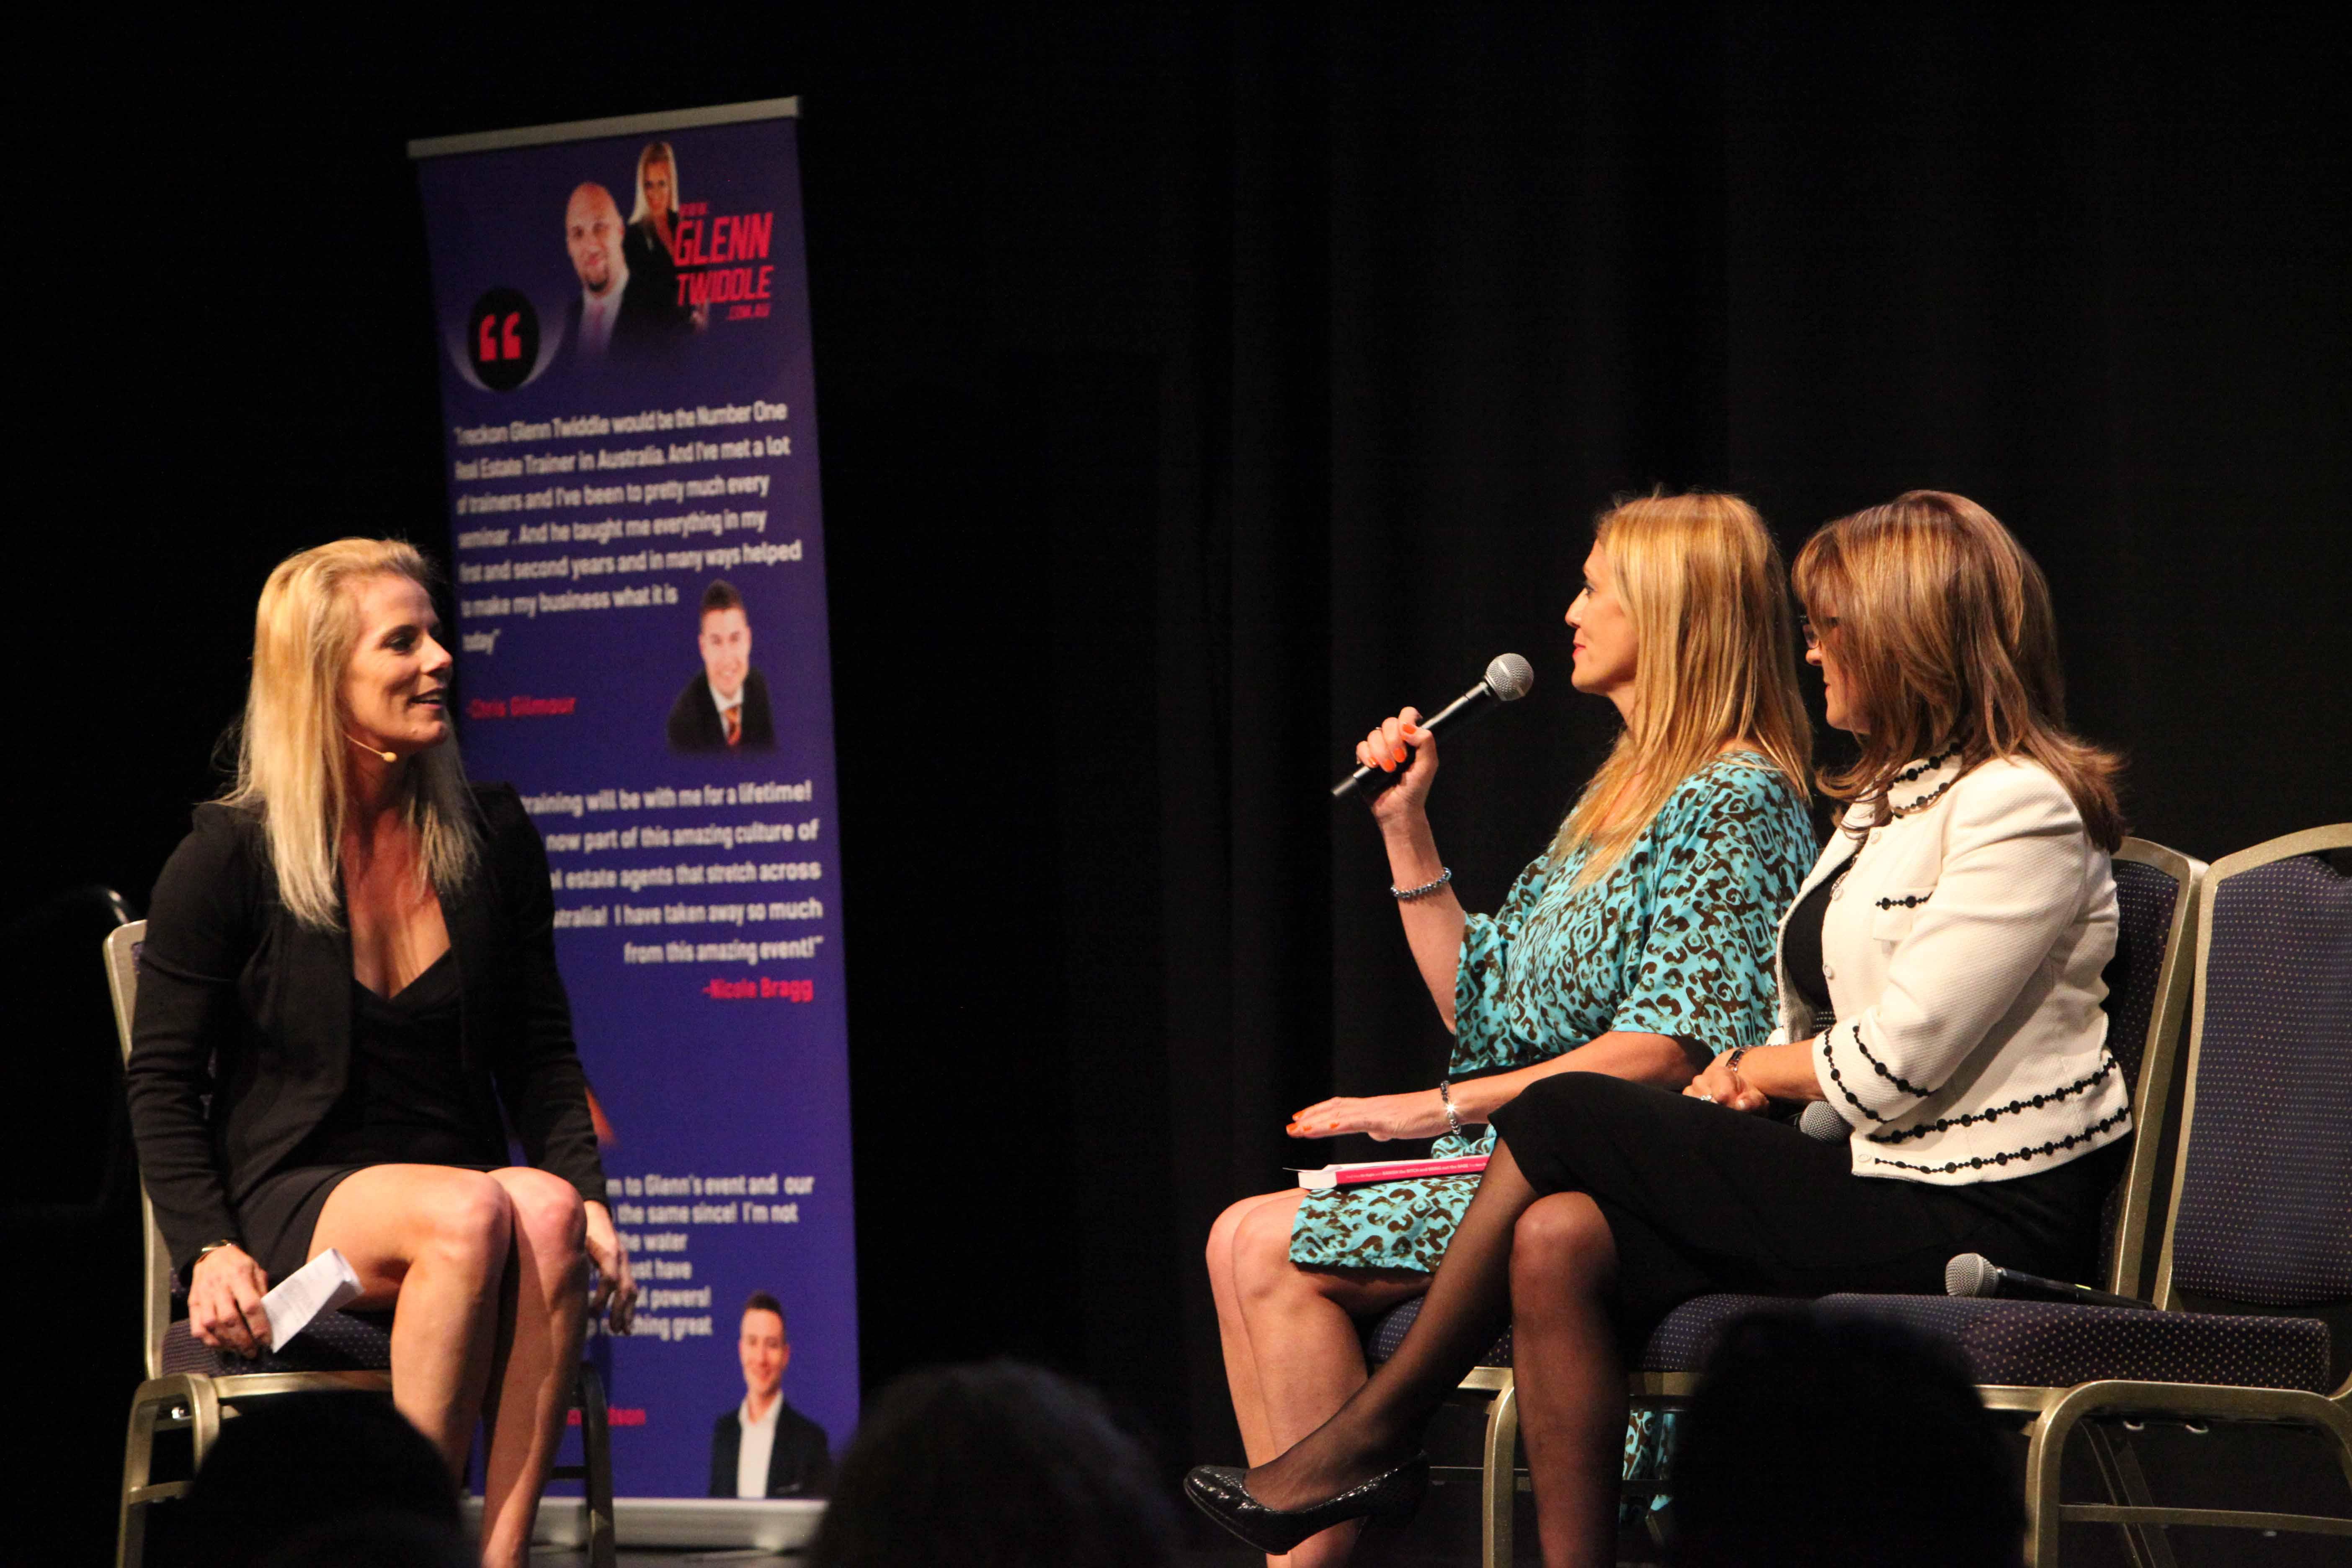 Speaking Lisa B. womens groups